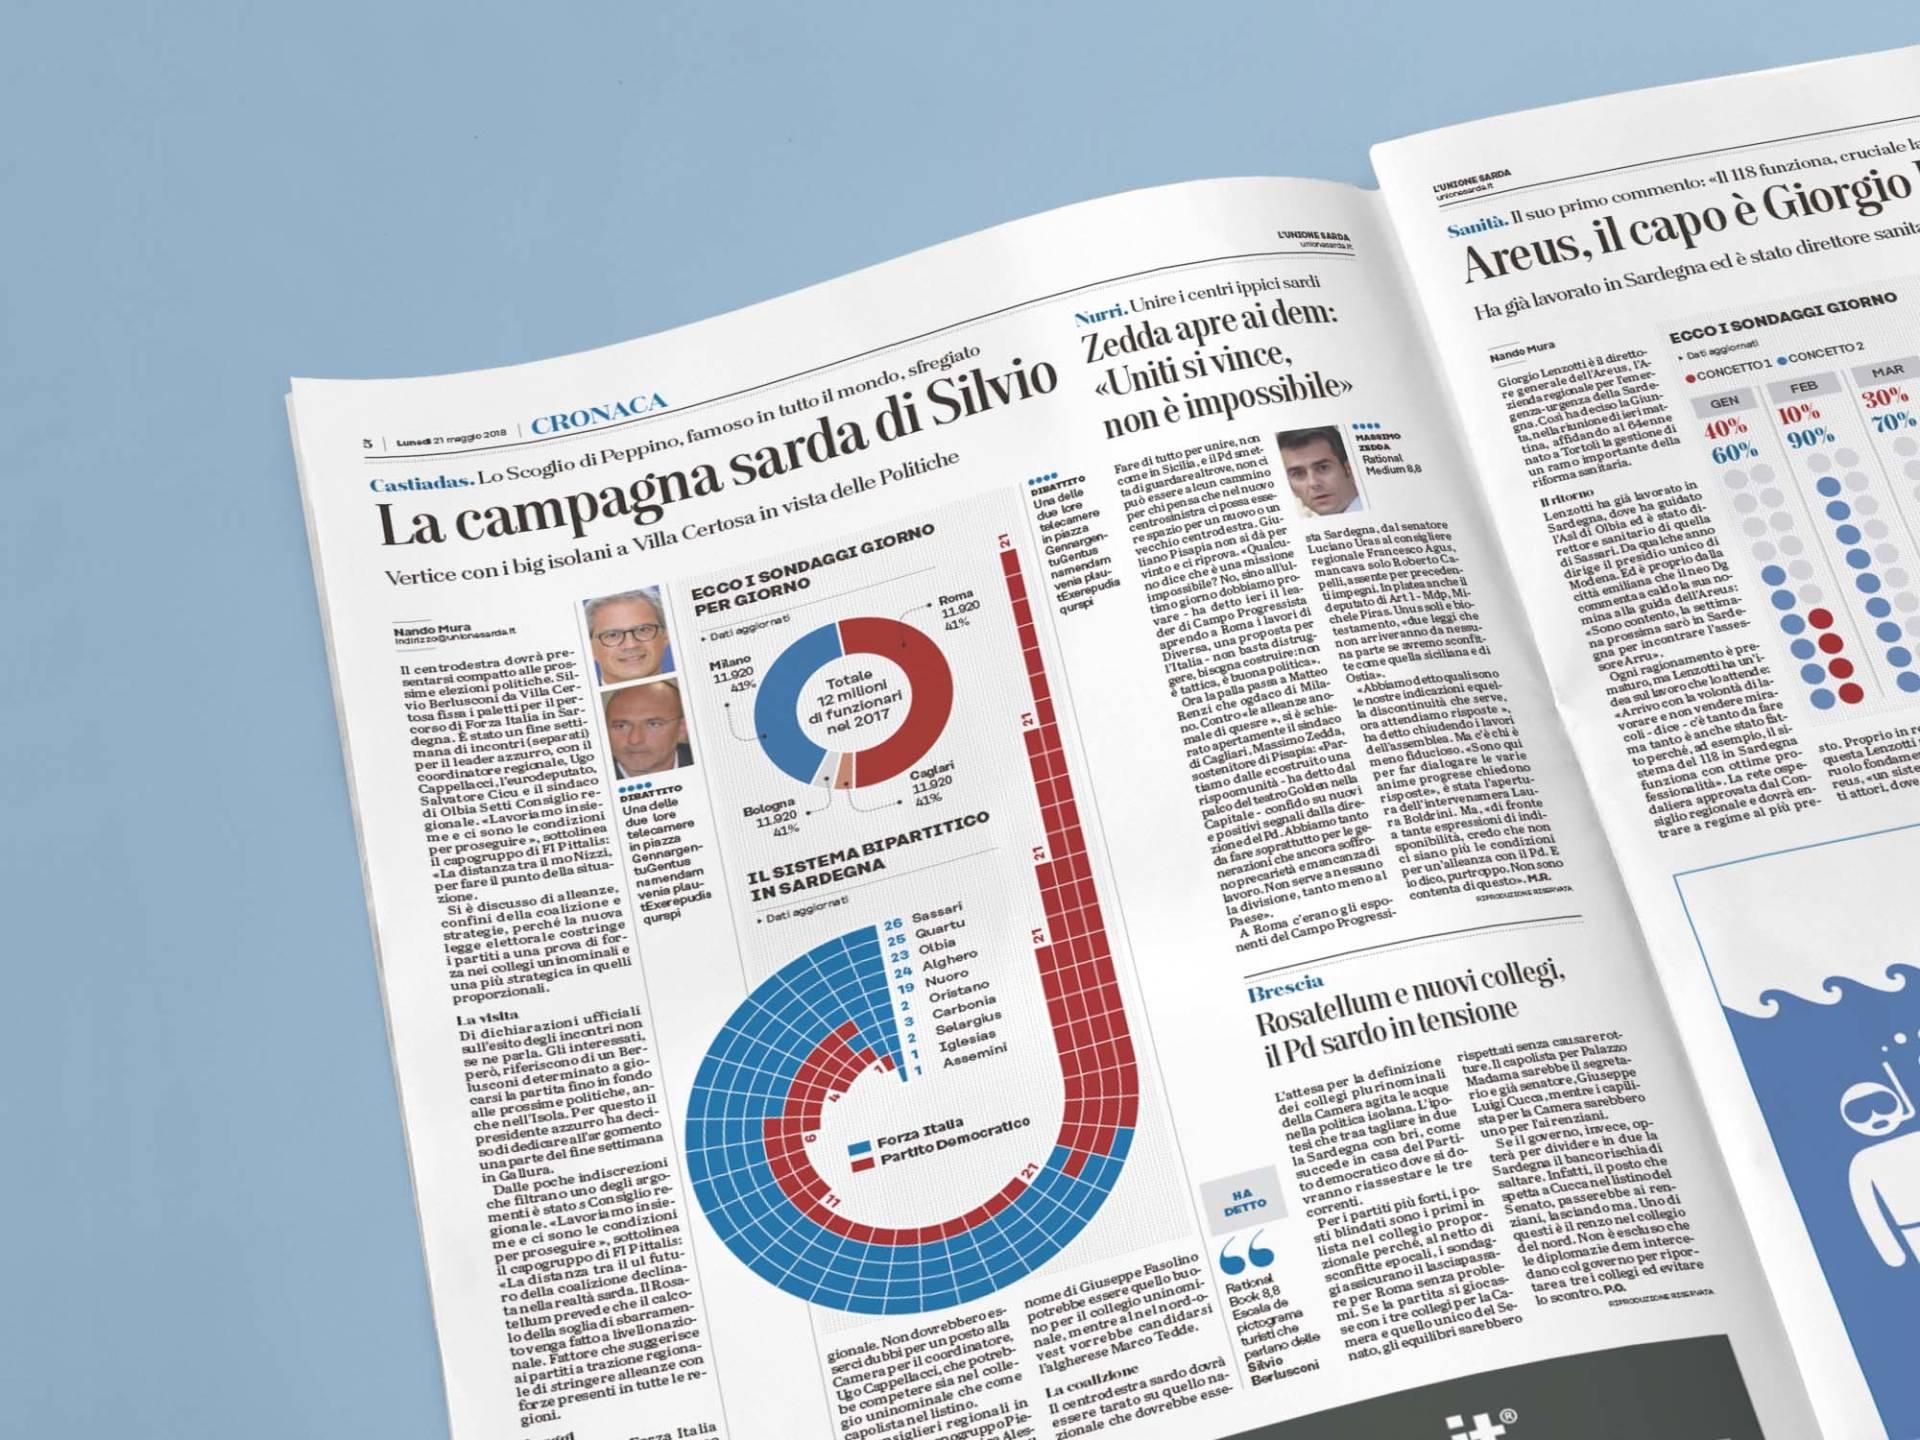 Unione_Sarda_Info_01_Wenceslau_News_Design